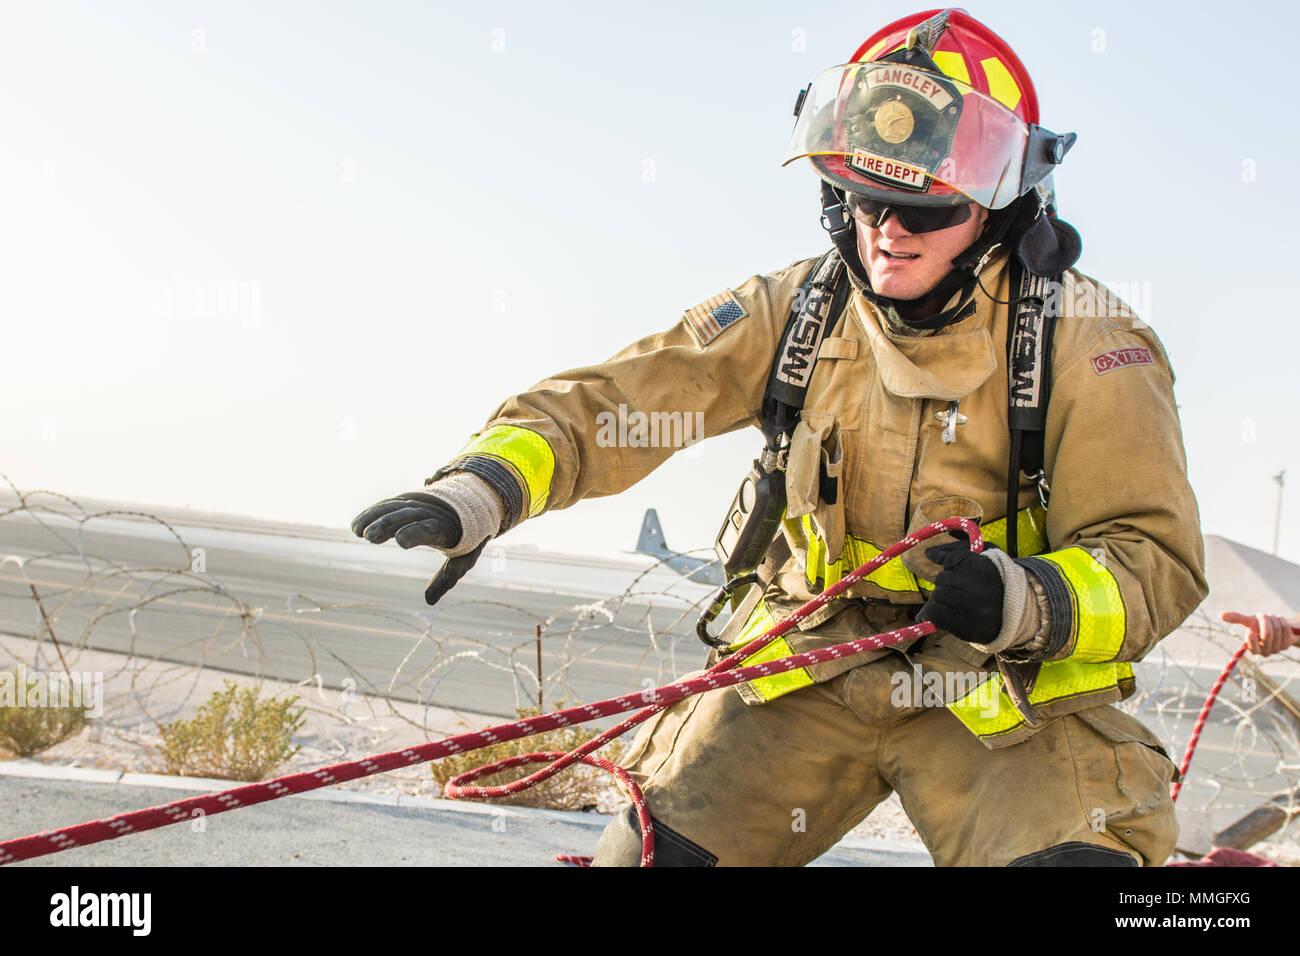 Firefighter Combat Challenge Stock Photos & Firefighter